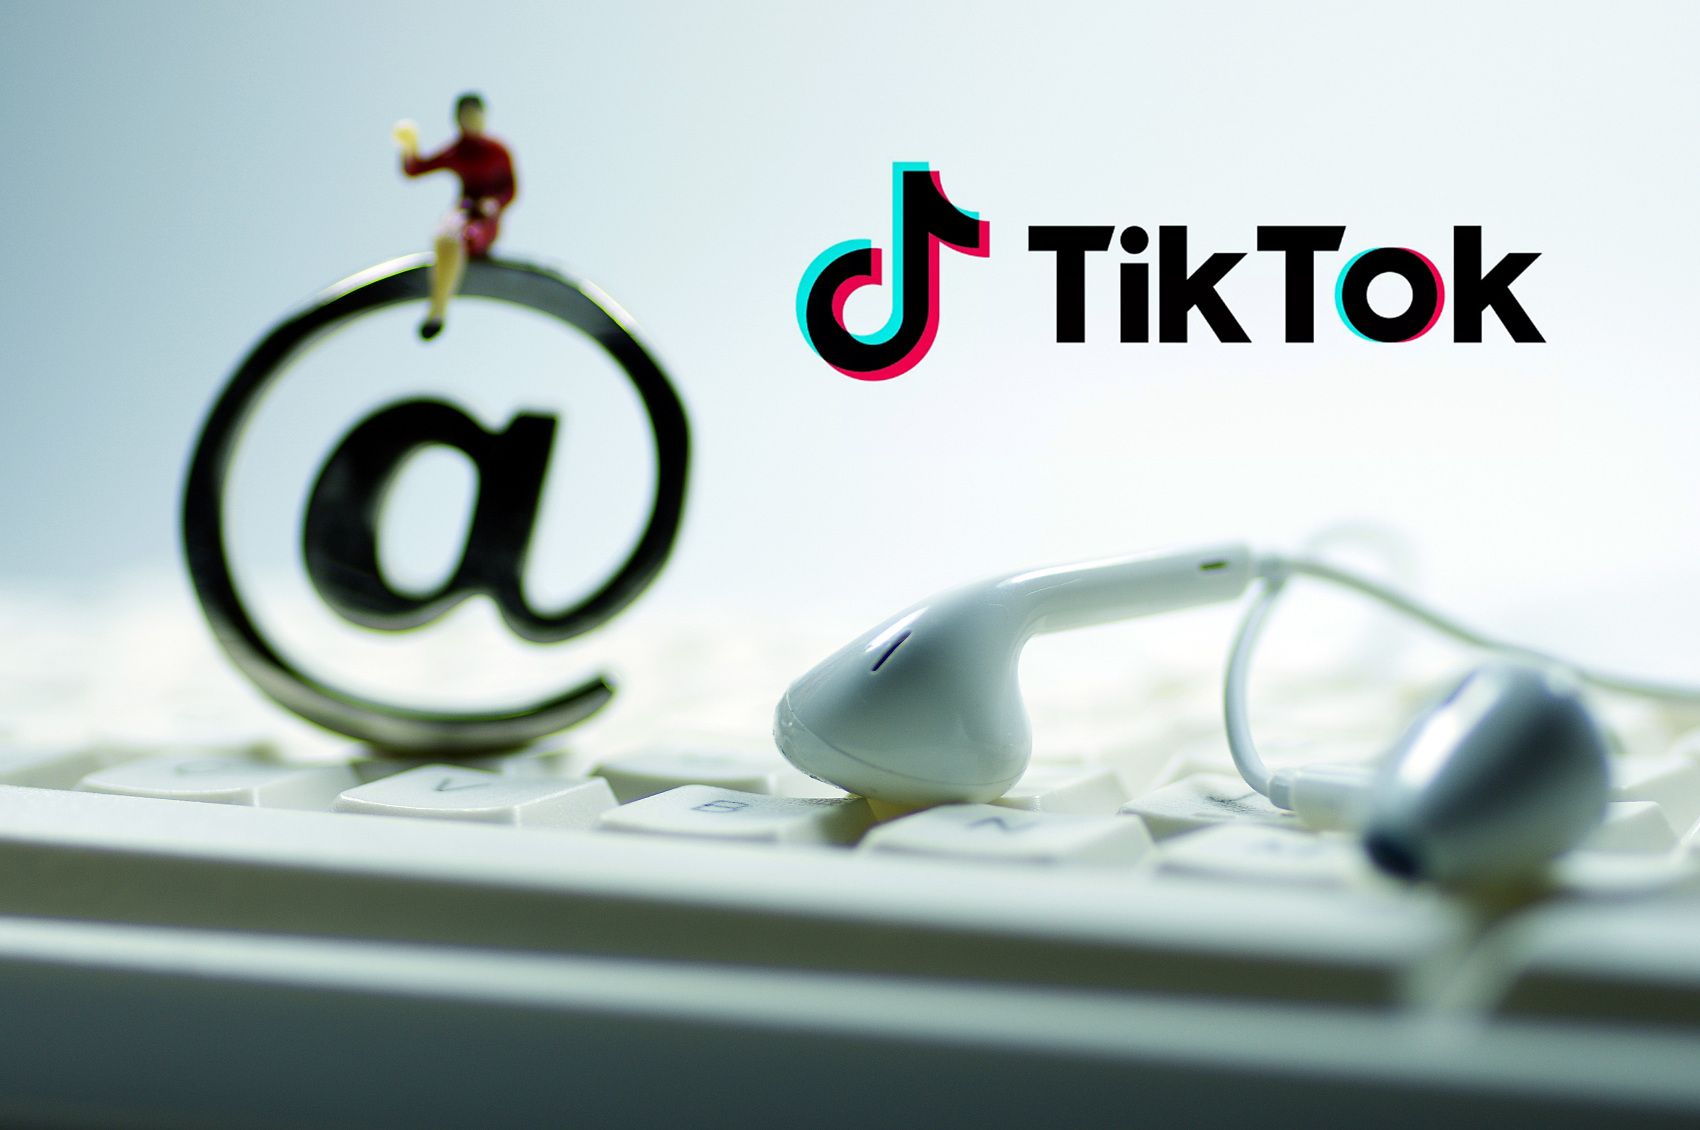 CIA: 'No evidence' showing China has intercepted data from TikTok